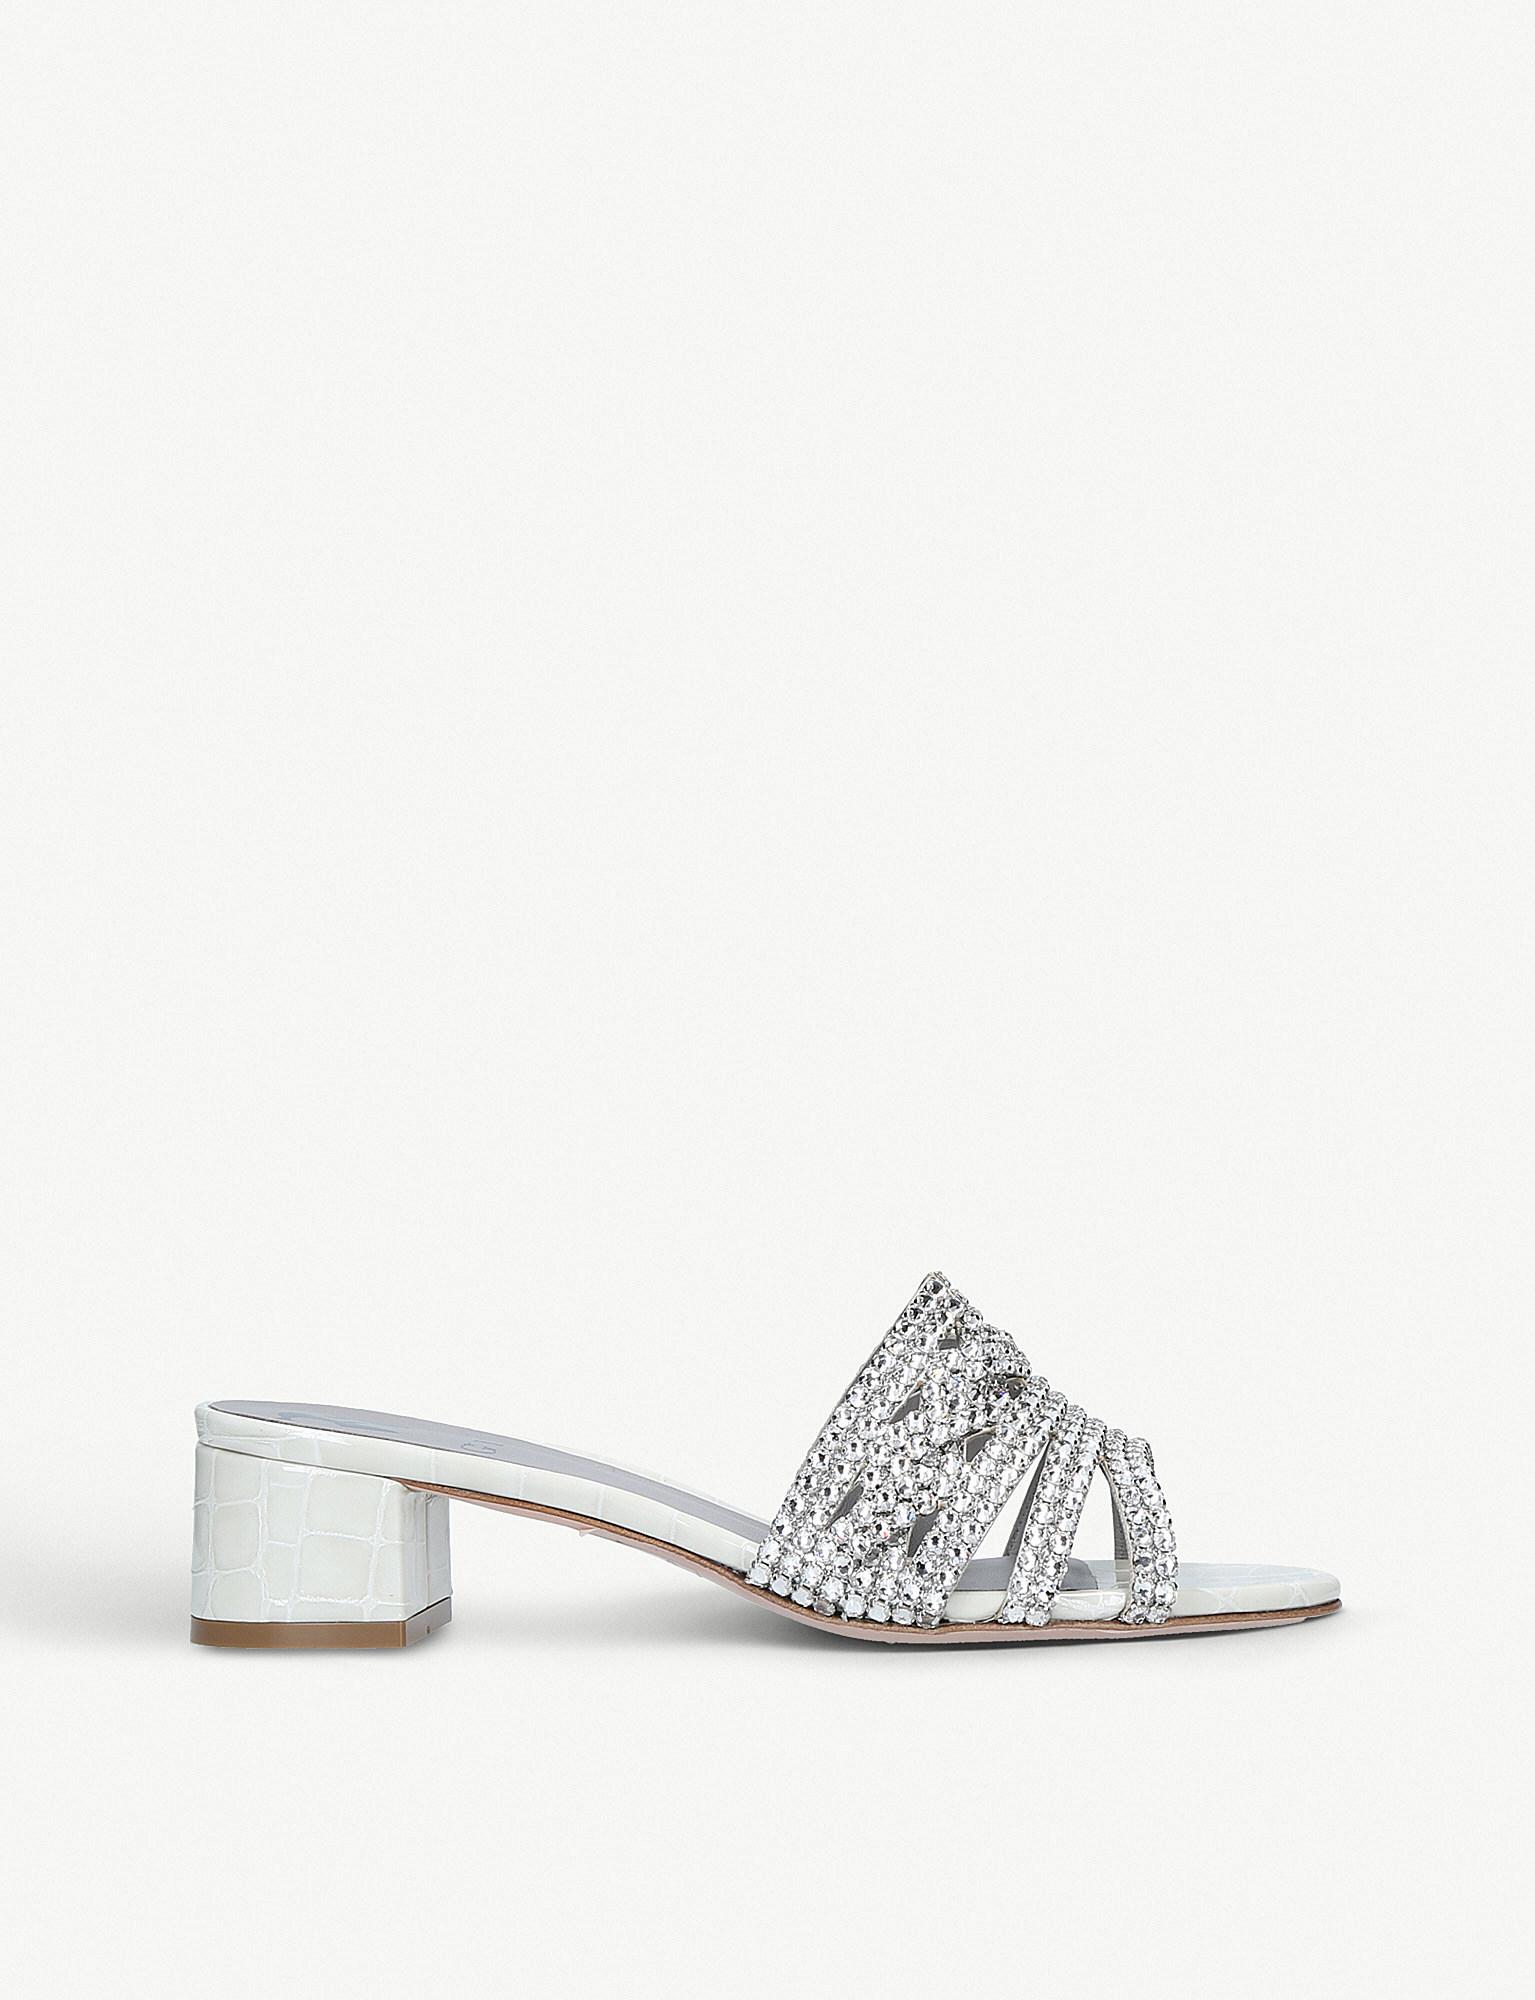 da7a783048d Gina Rodeo Crocodile-embossed Leather Mules in Metallic - Lyst